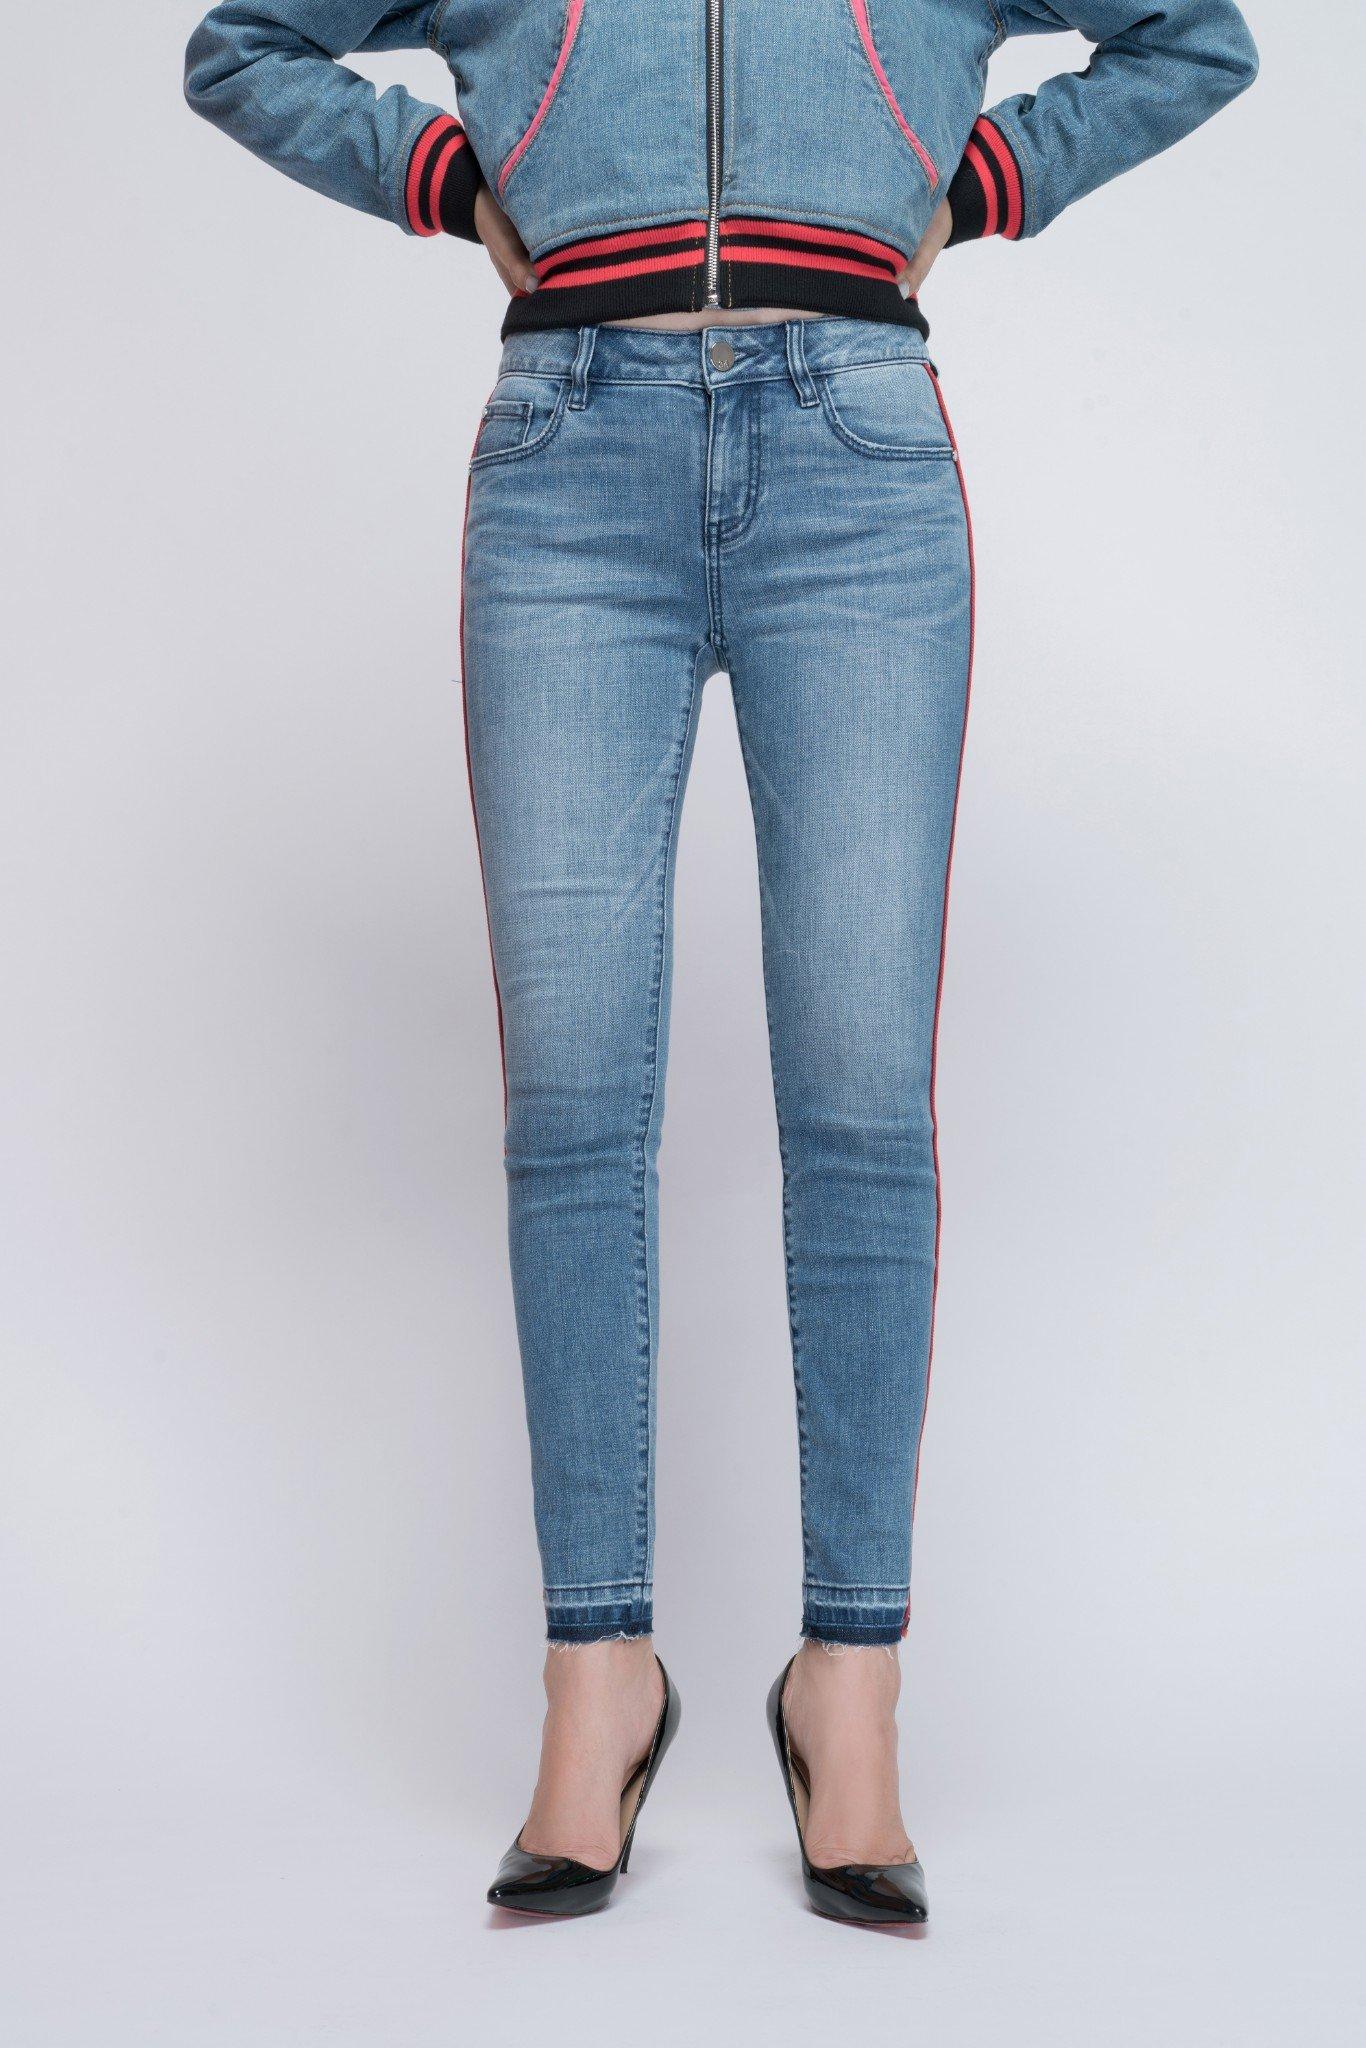 Quần jean nữ dáng skinny- 119WD2081F1950